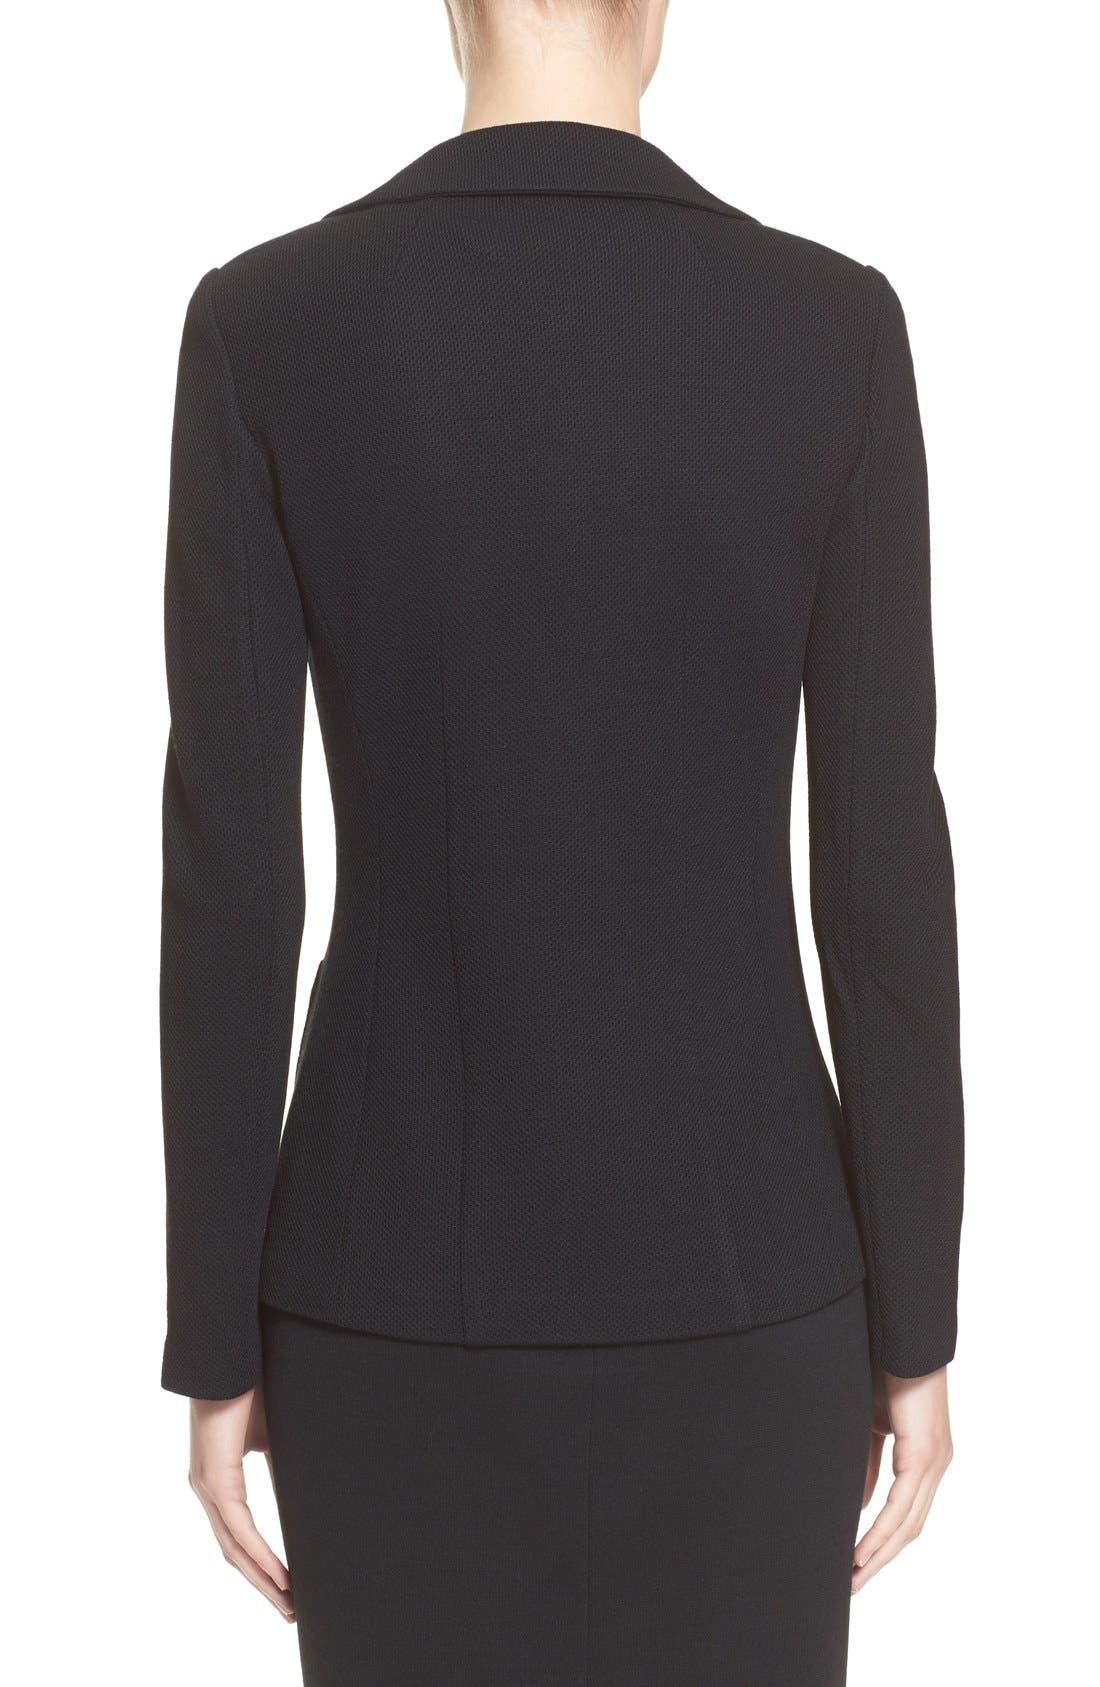 Milano Piqué Knit Jacket,                             Alternate thumbnail 2, color,                             CAVIAR